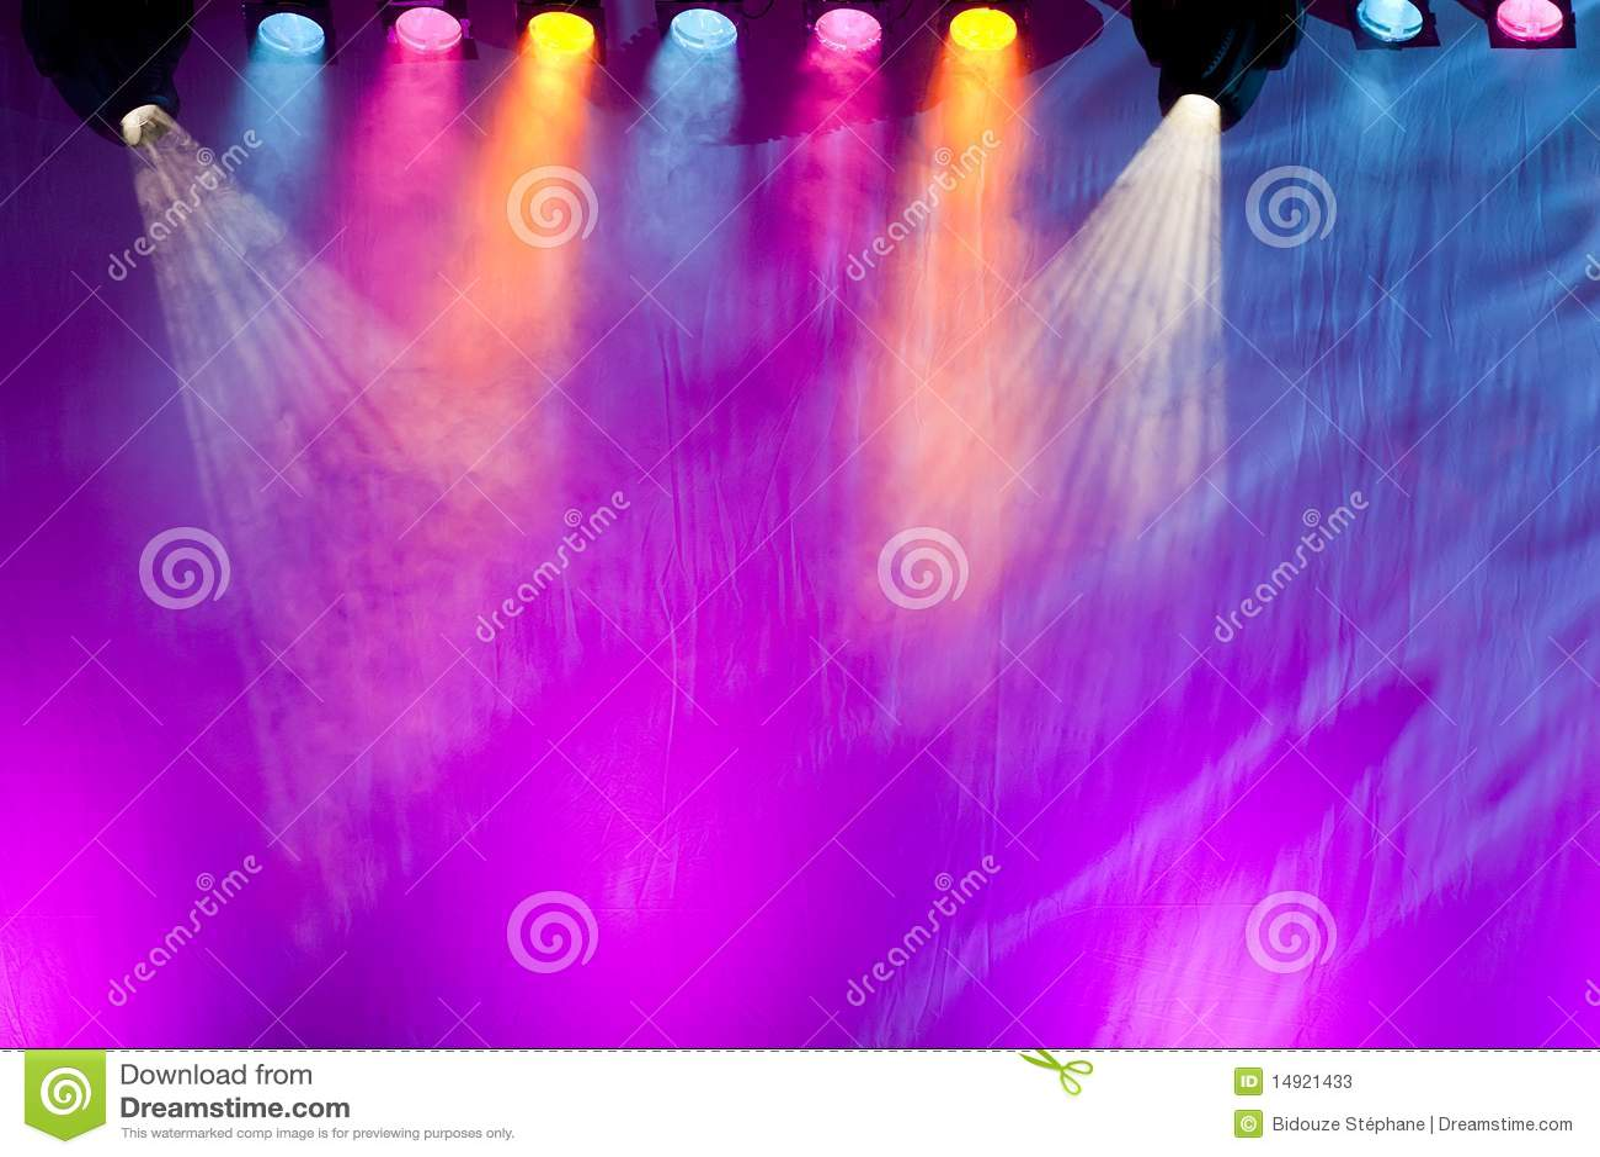 Vivid Stage Spotlights Stock s Image